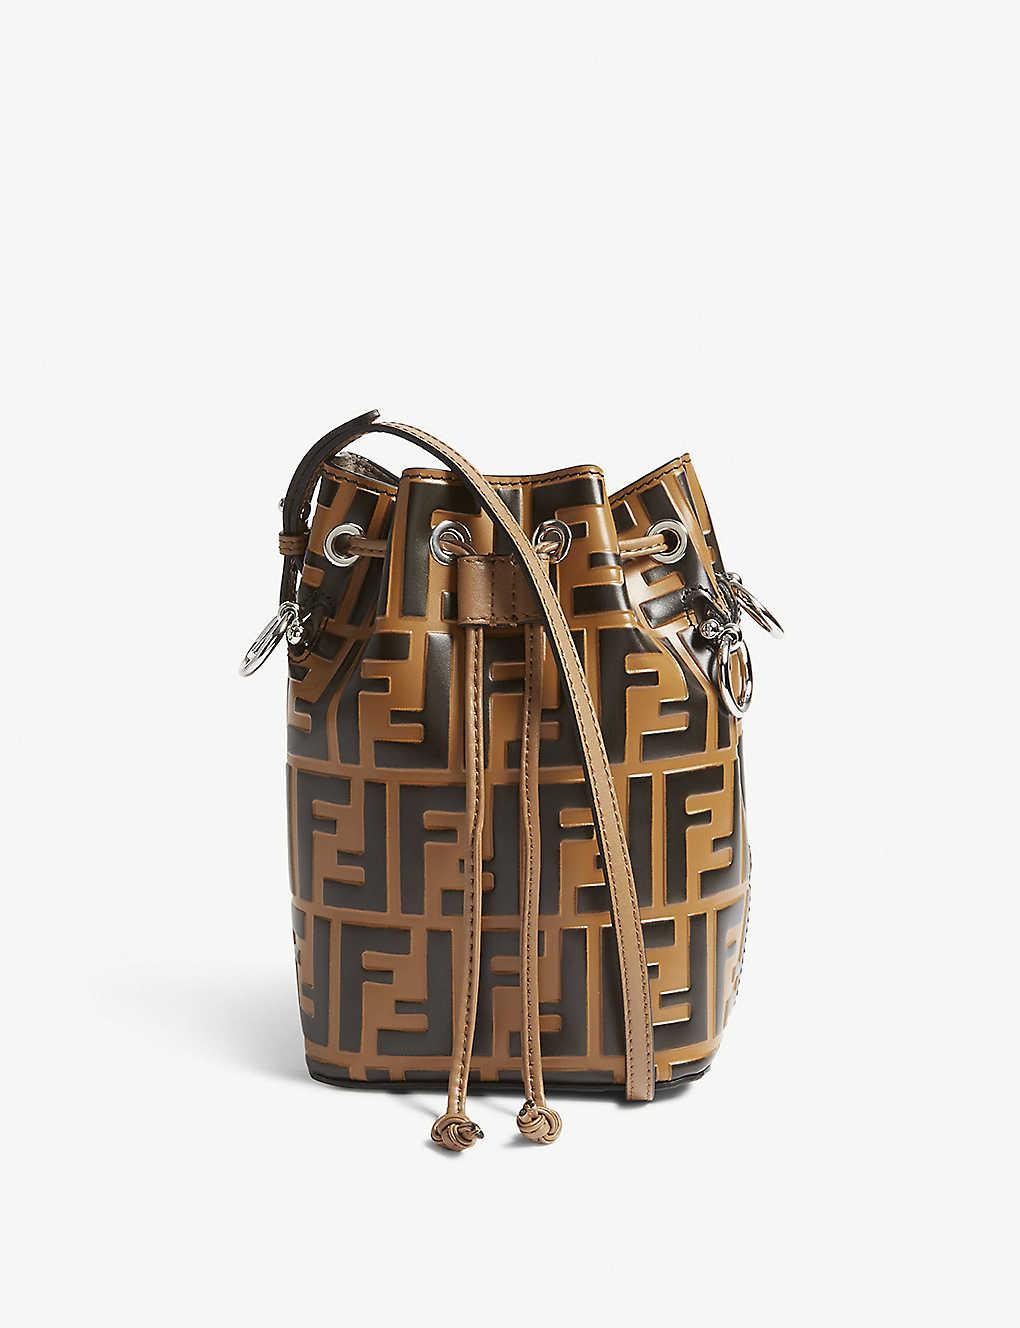 eedca58a037 FENDI - Mon Tresor small leather bucket bag | Selfridges.com